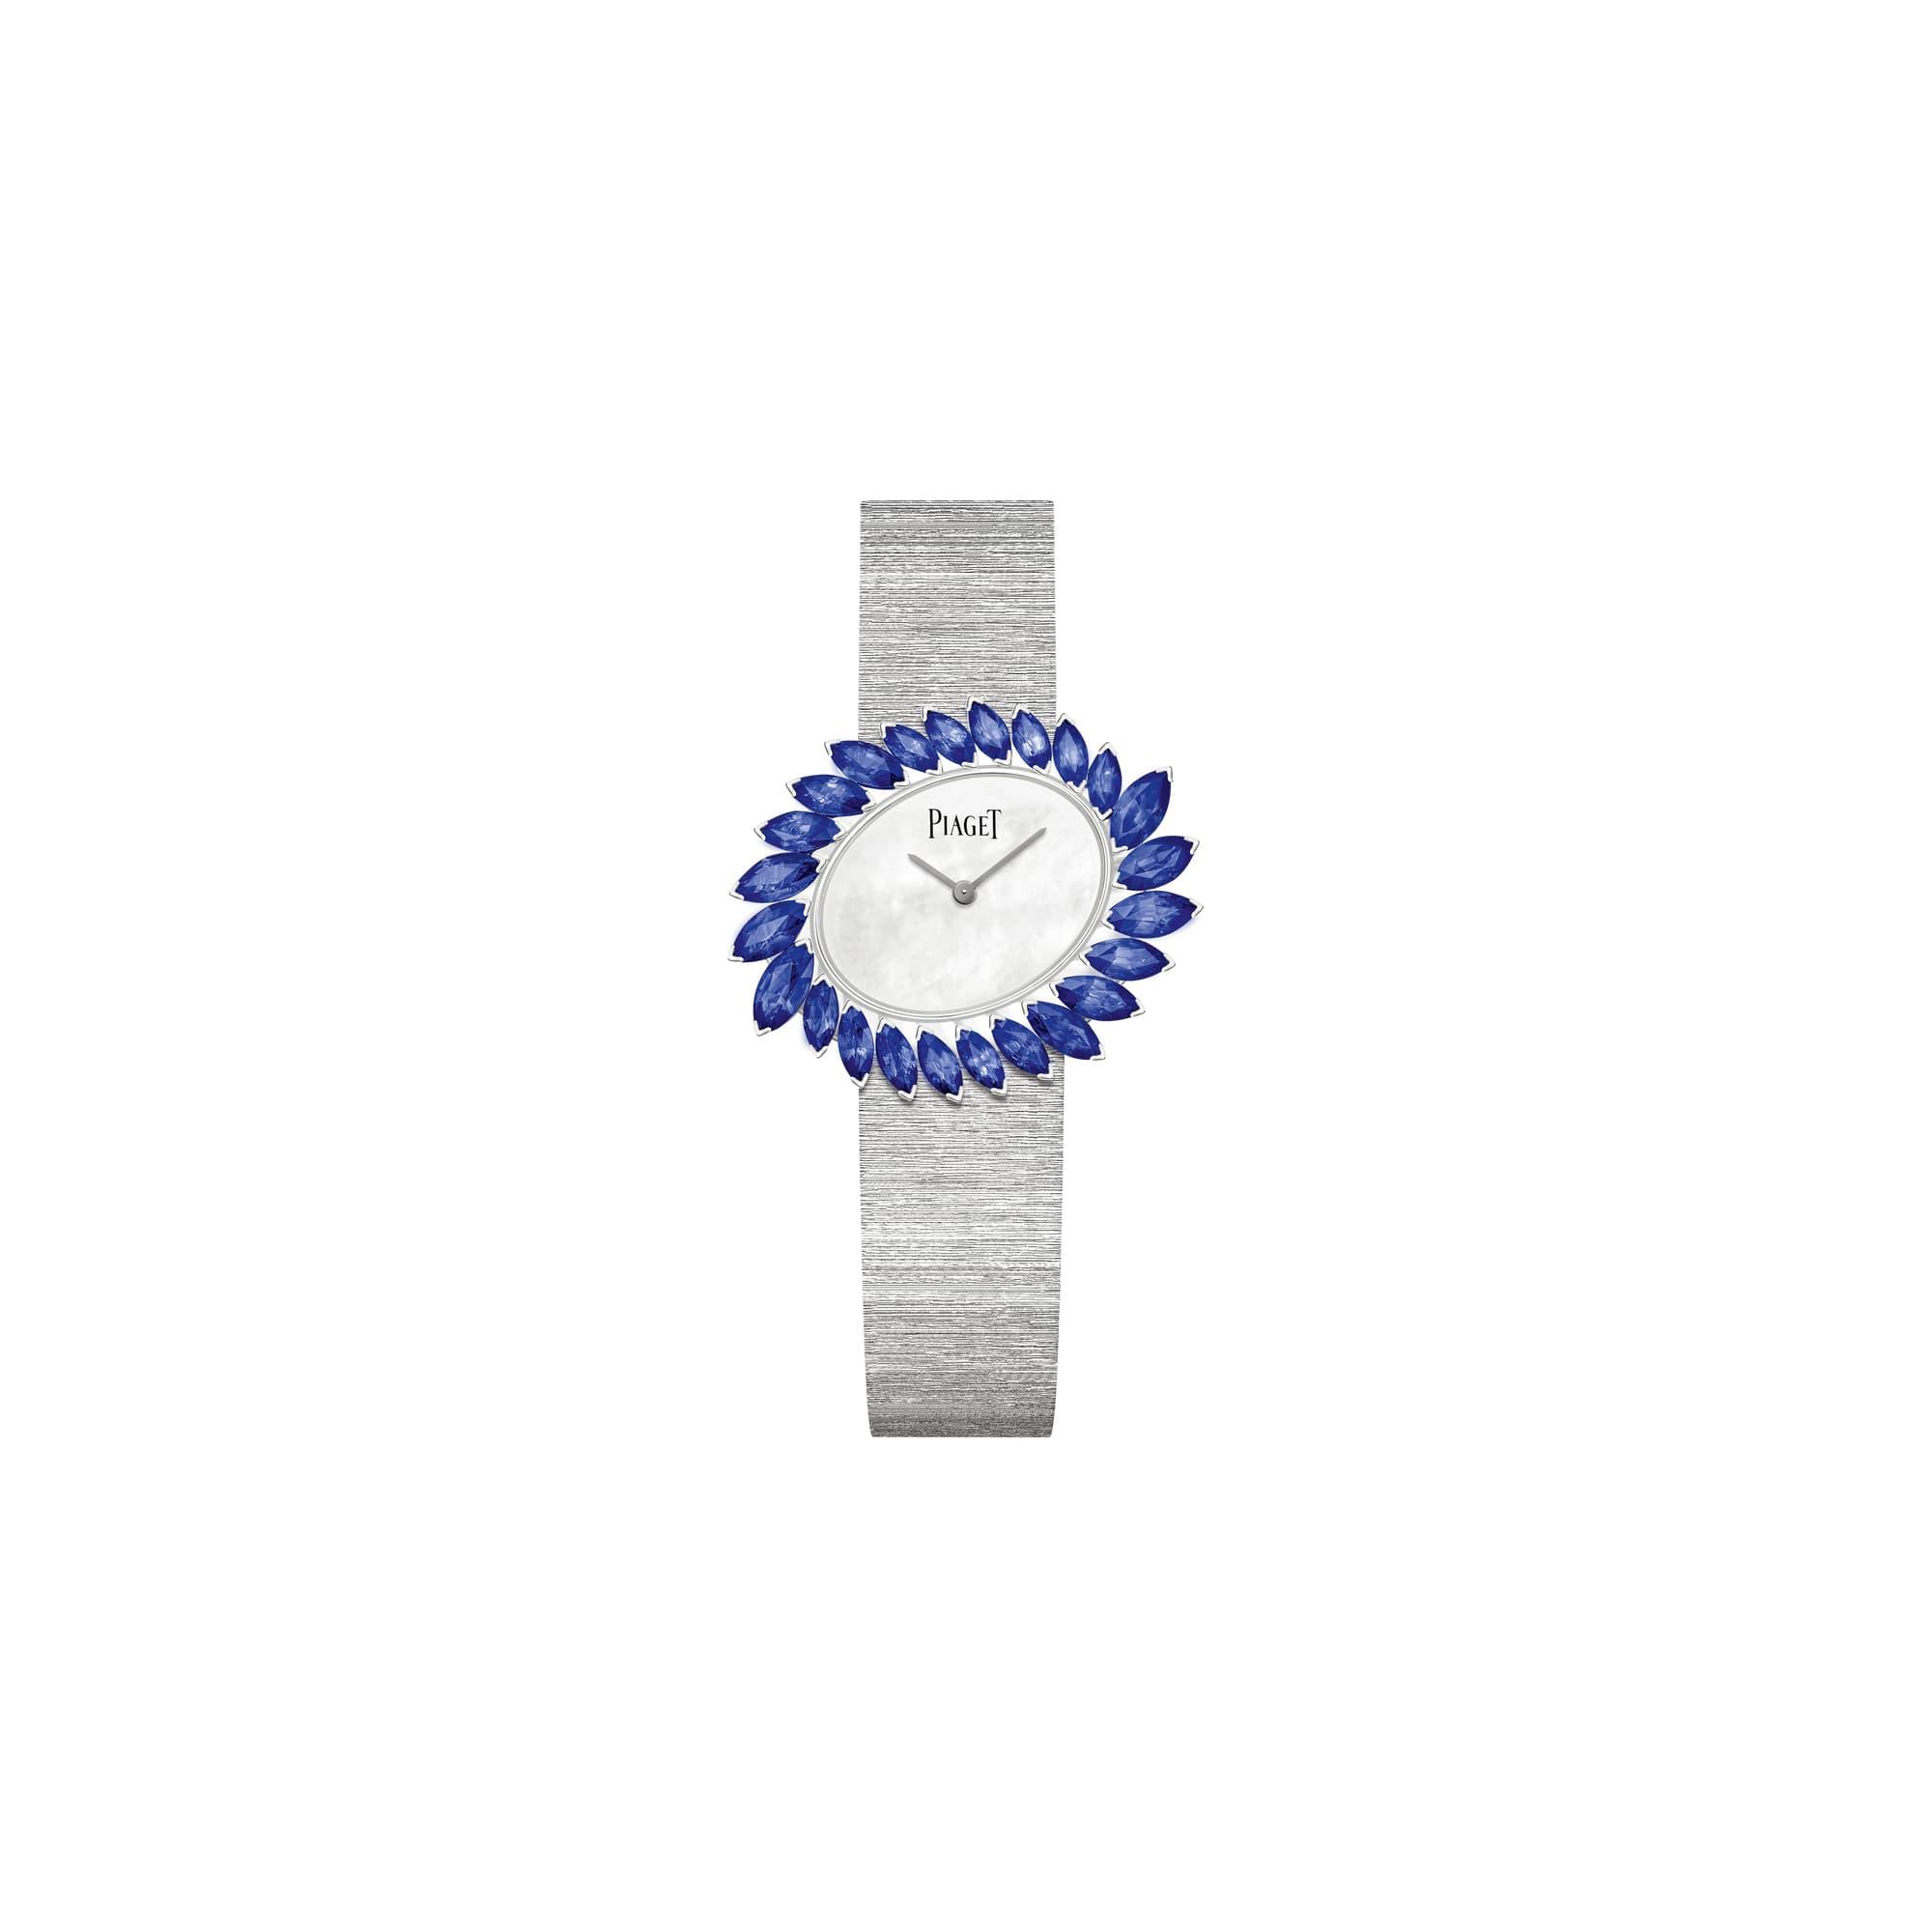 golden oasis白金腕表,镶饰蓝宝石